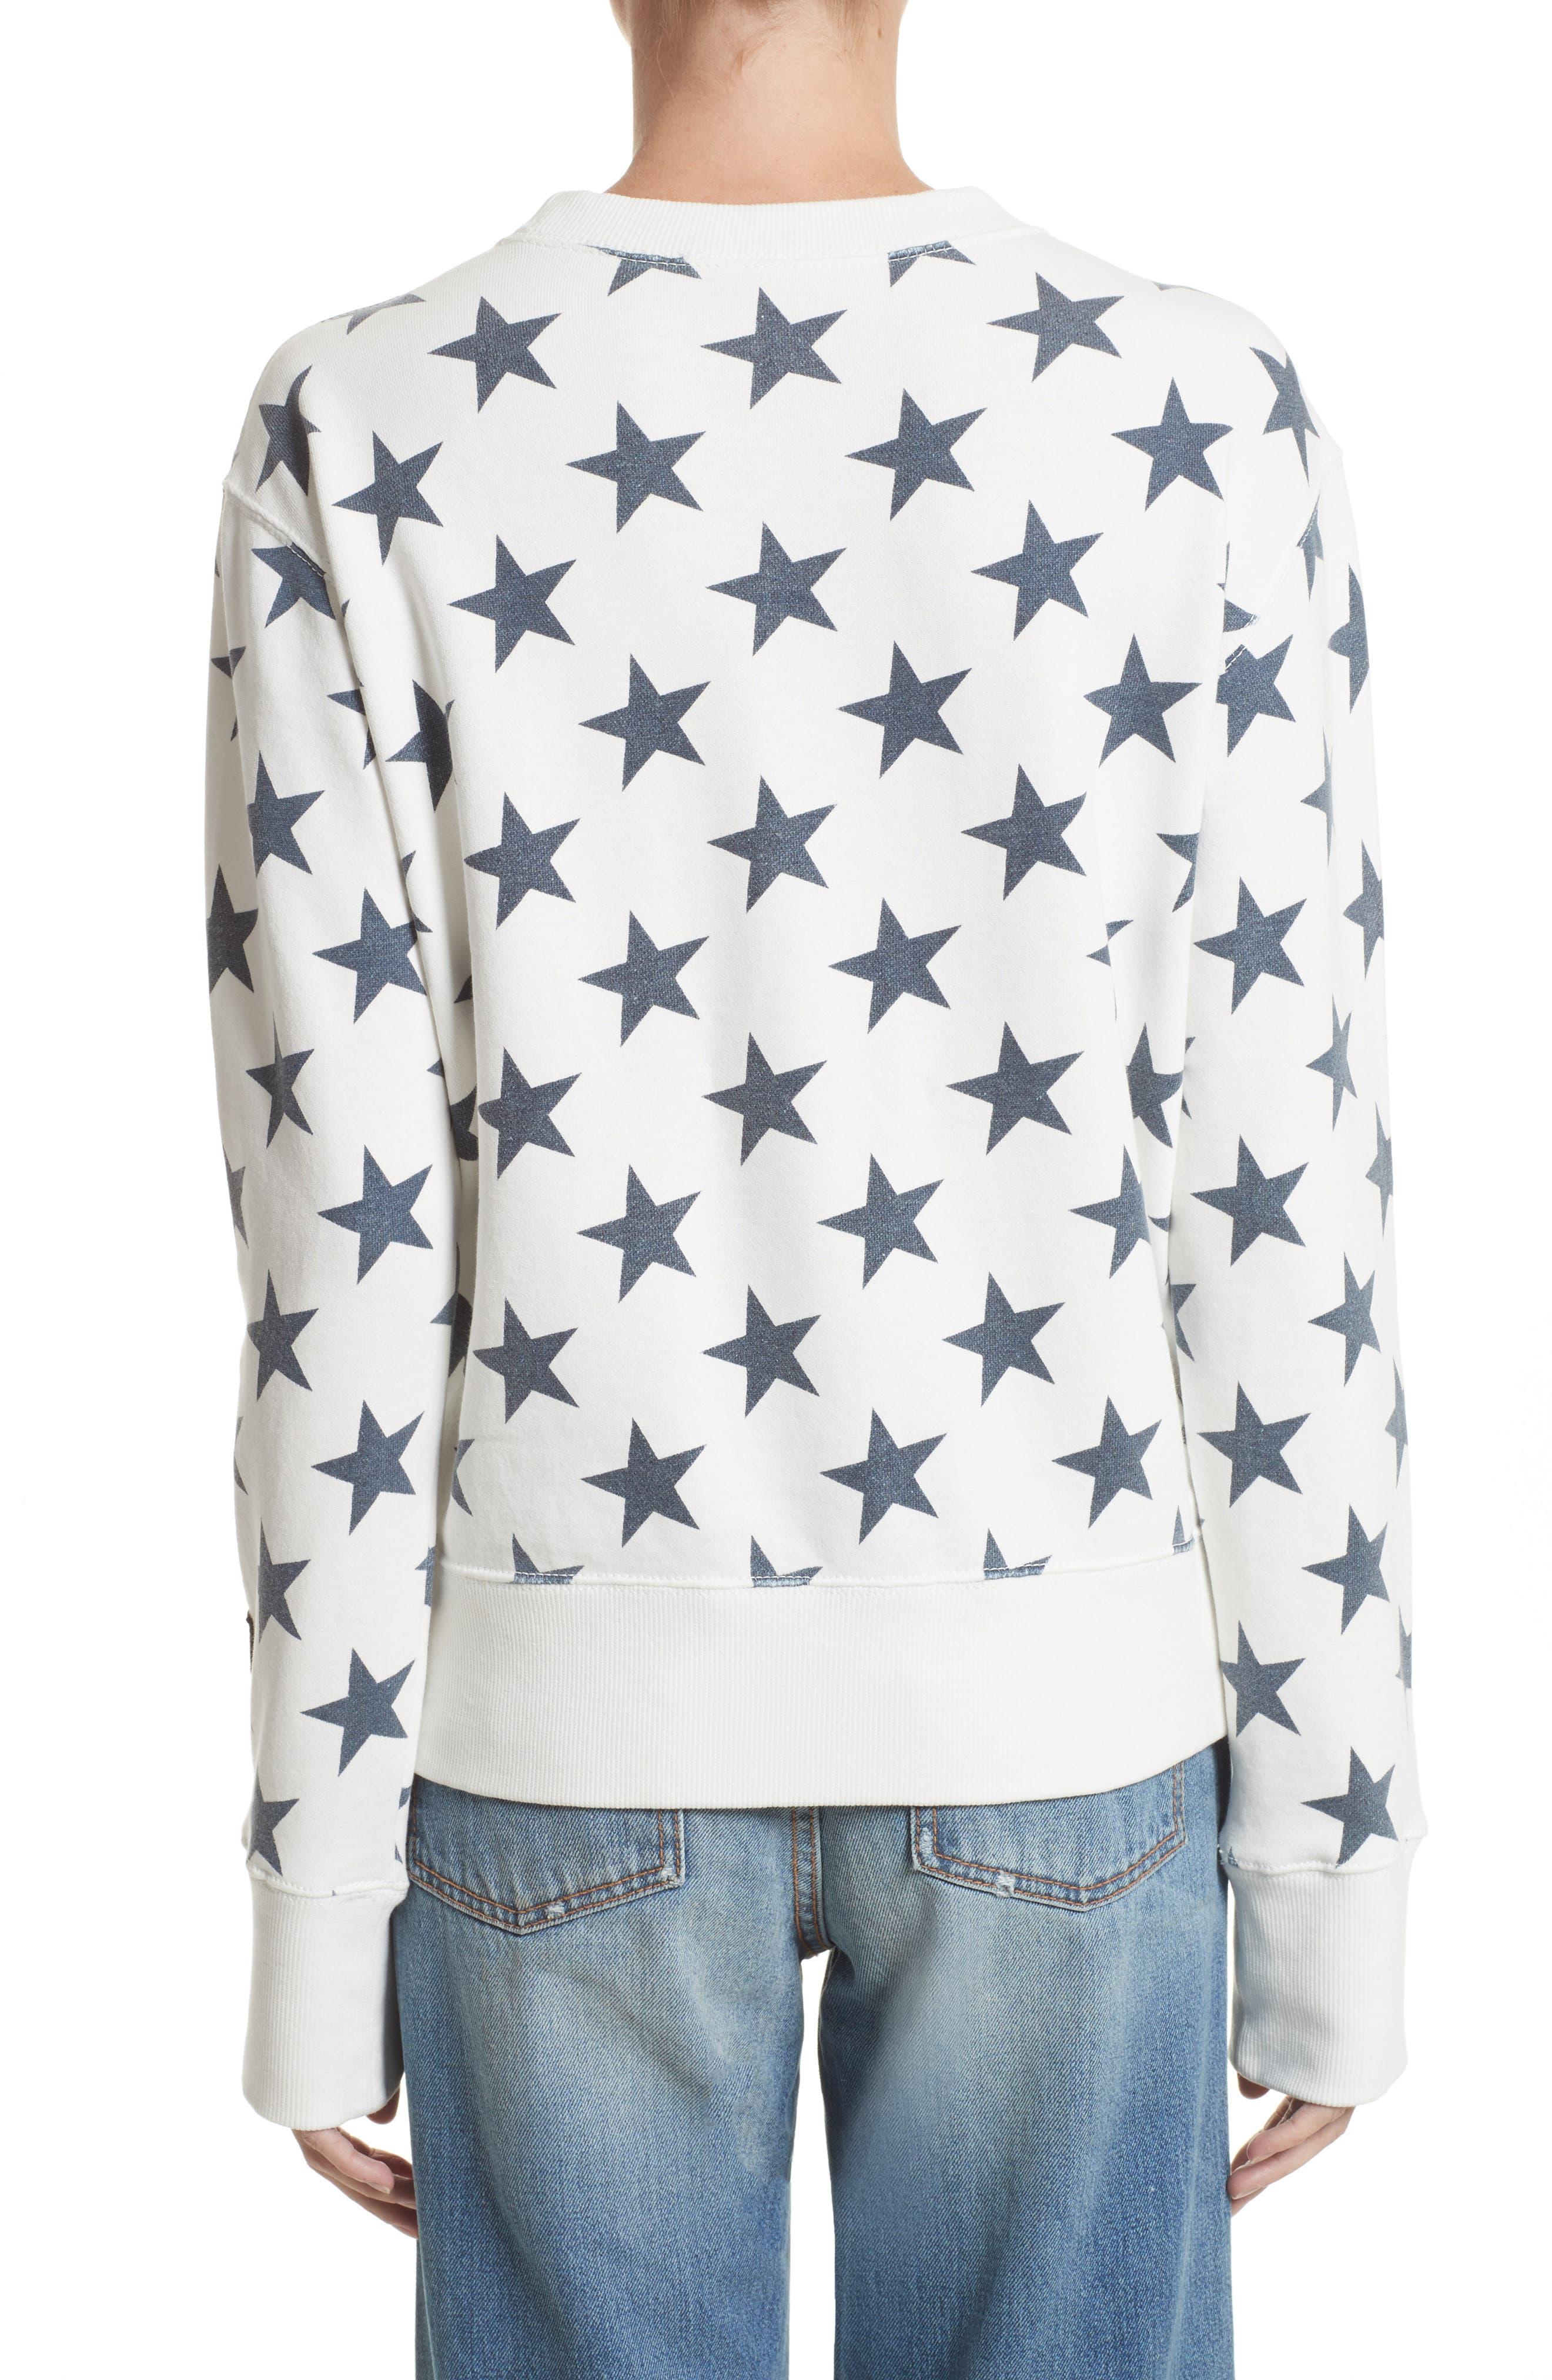 '90s Star Print Sweatshirt,                             Alternate thumbnail 2, color,                             Ivory Multi